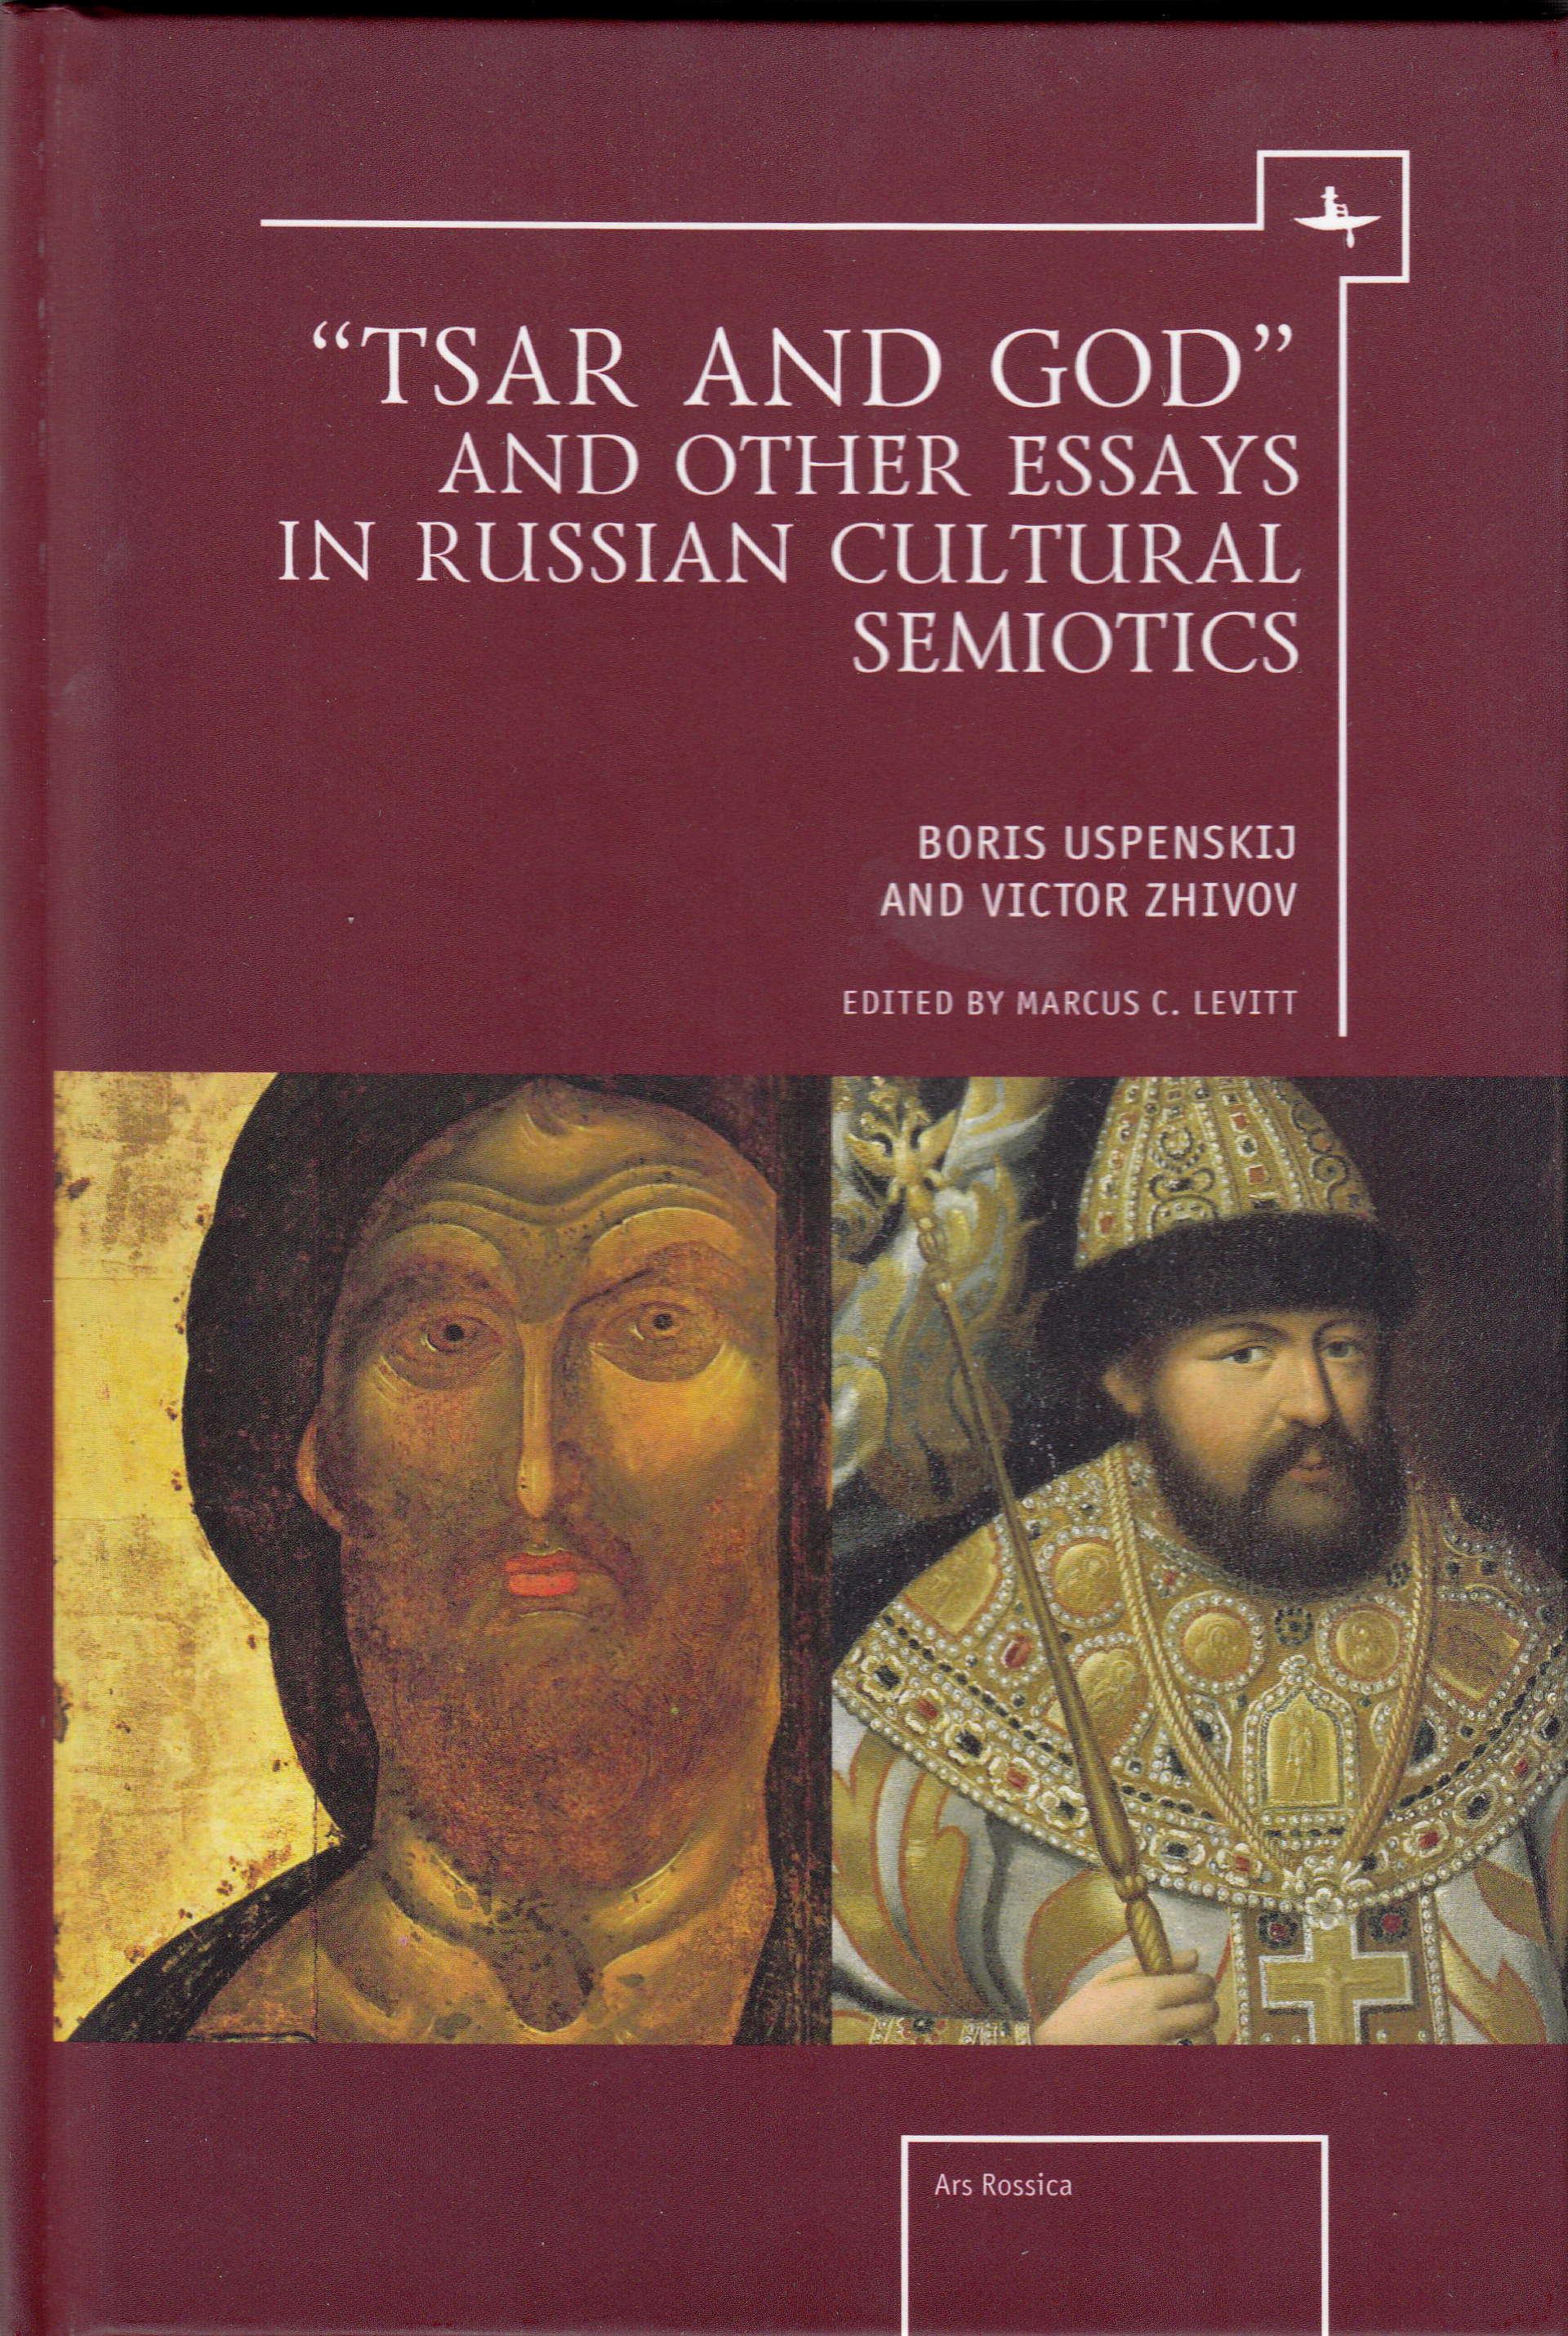 Tsar and Pretender: Samozvanchestvo or Royal Imposture in Russia as a Cultural-Historical Phenomenon